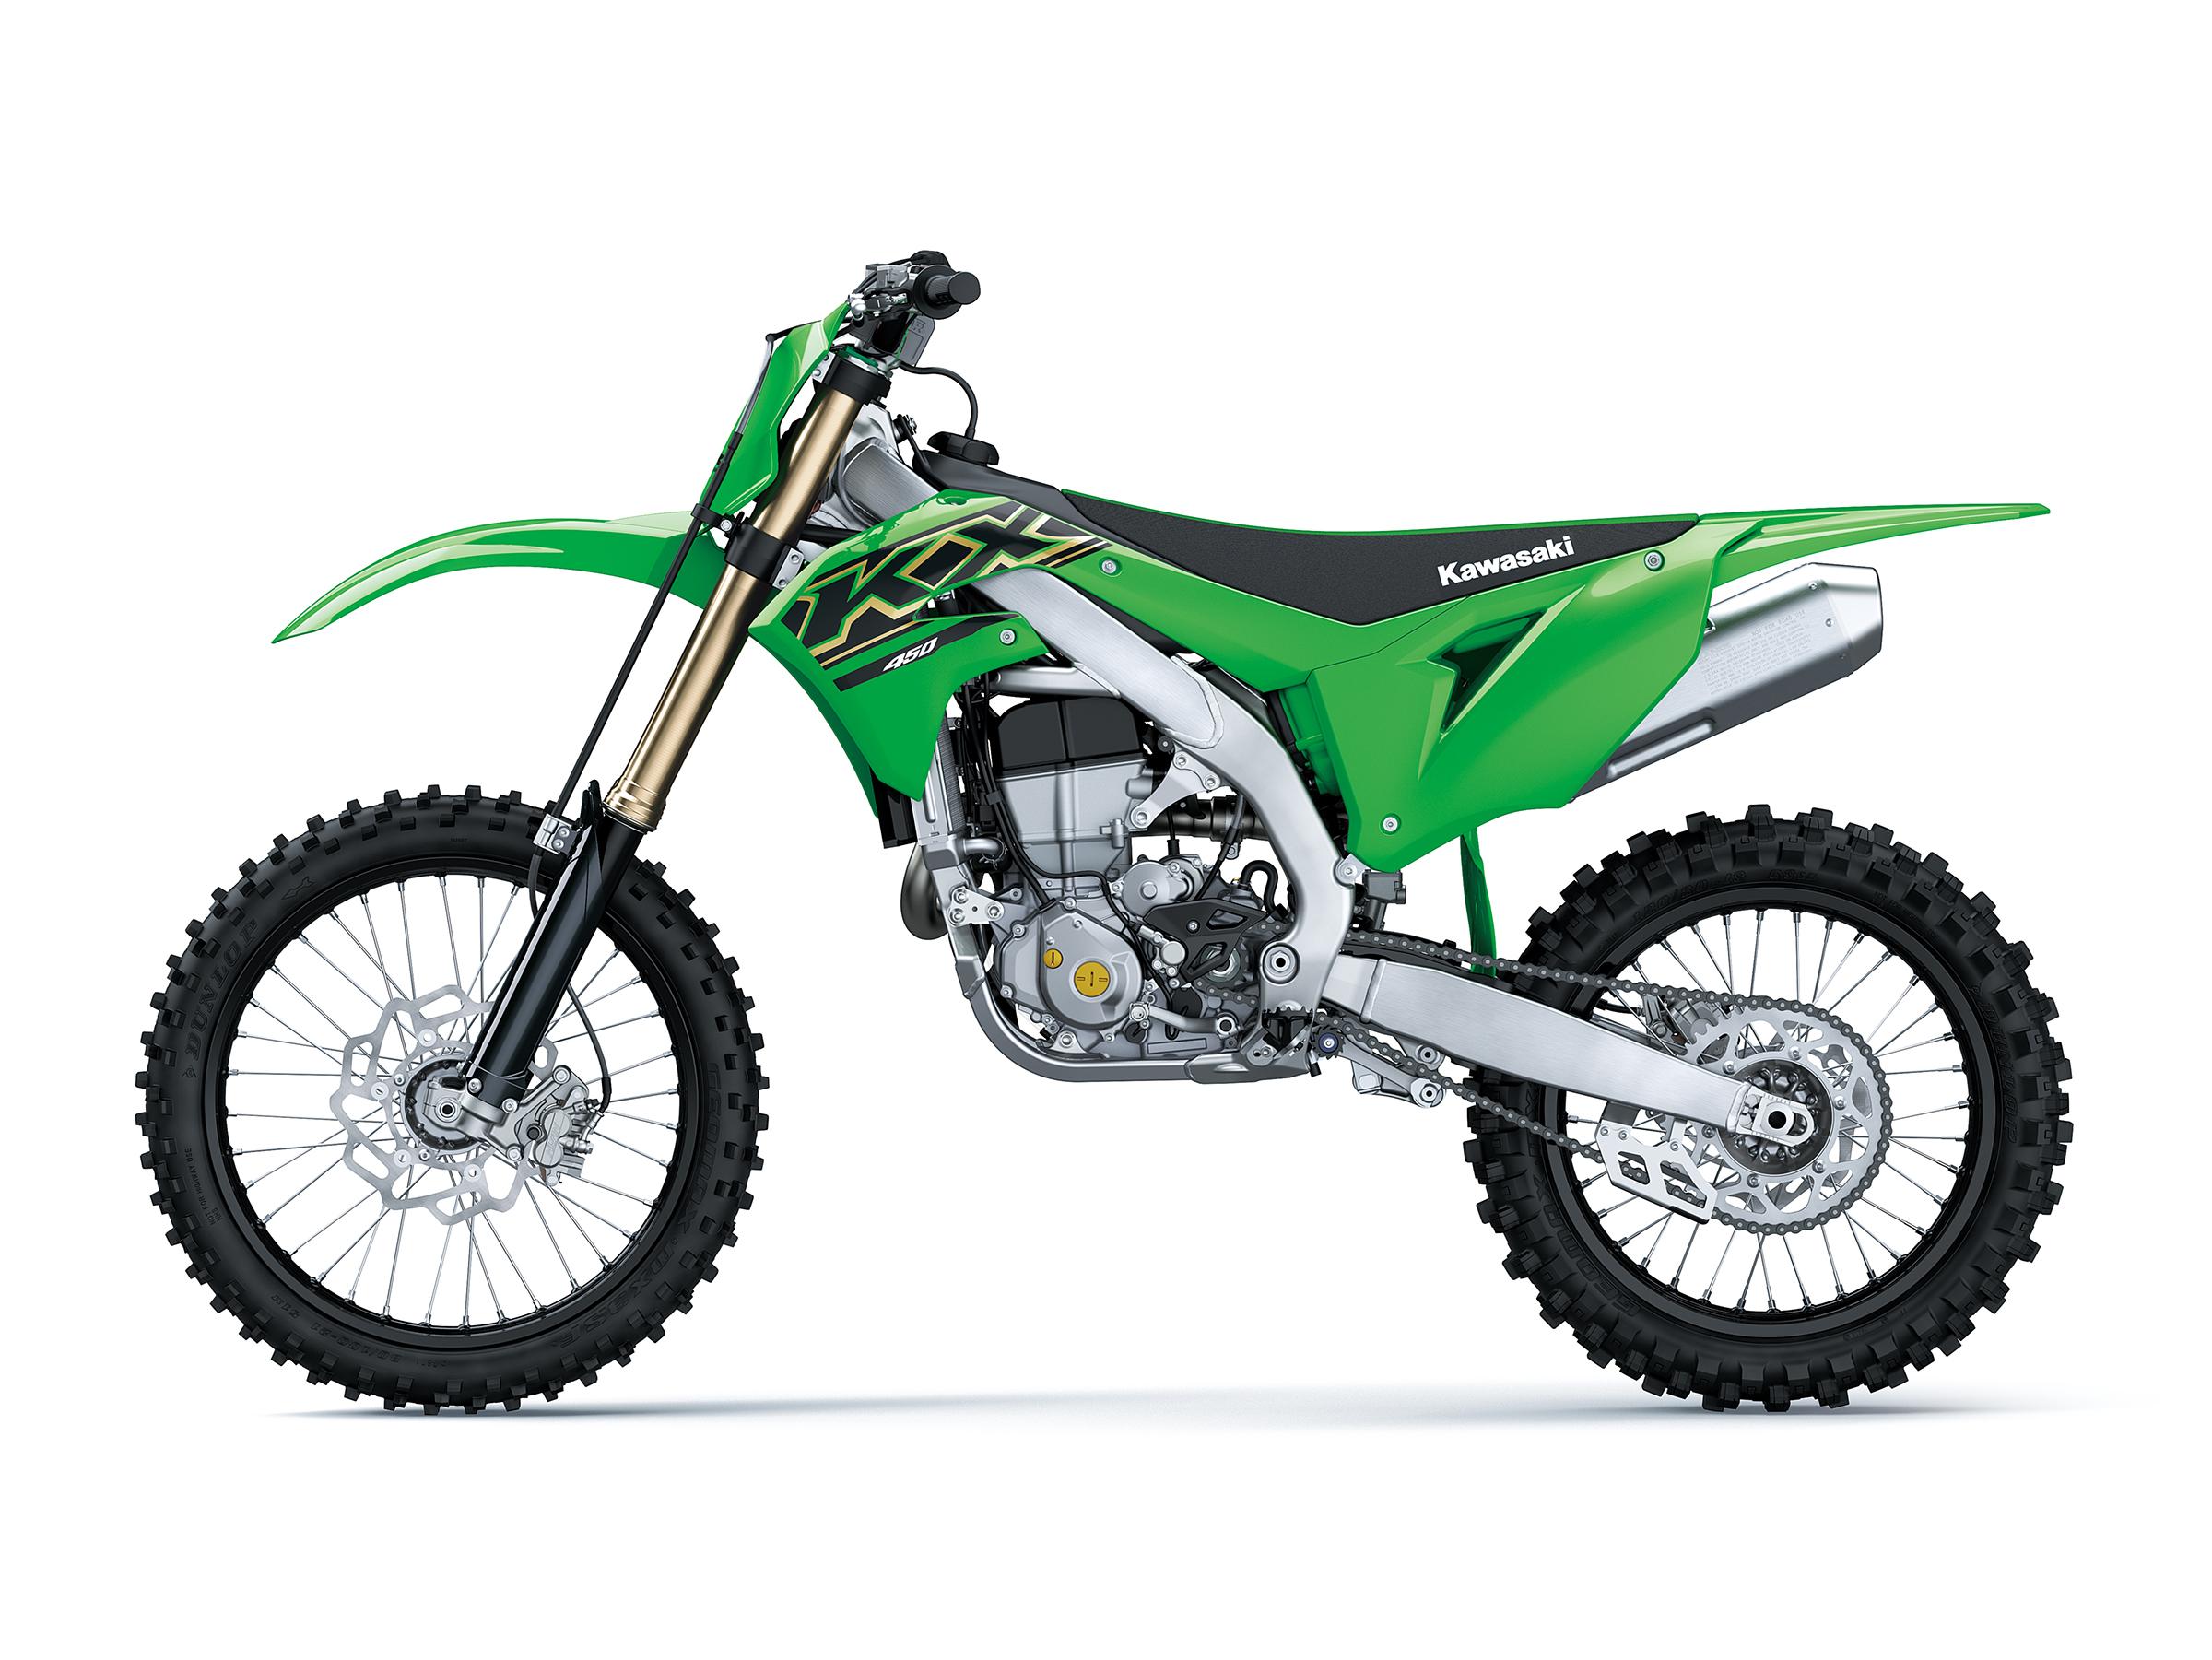 KX450